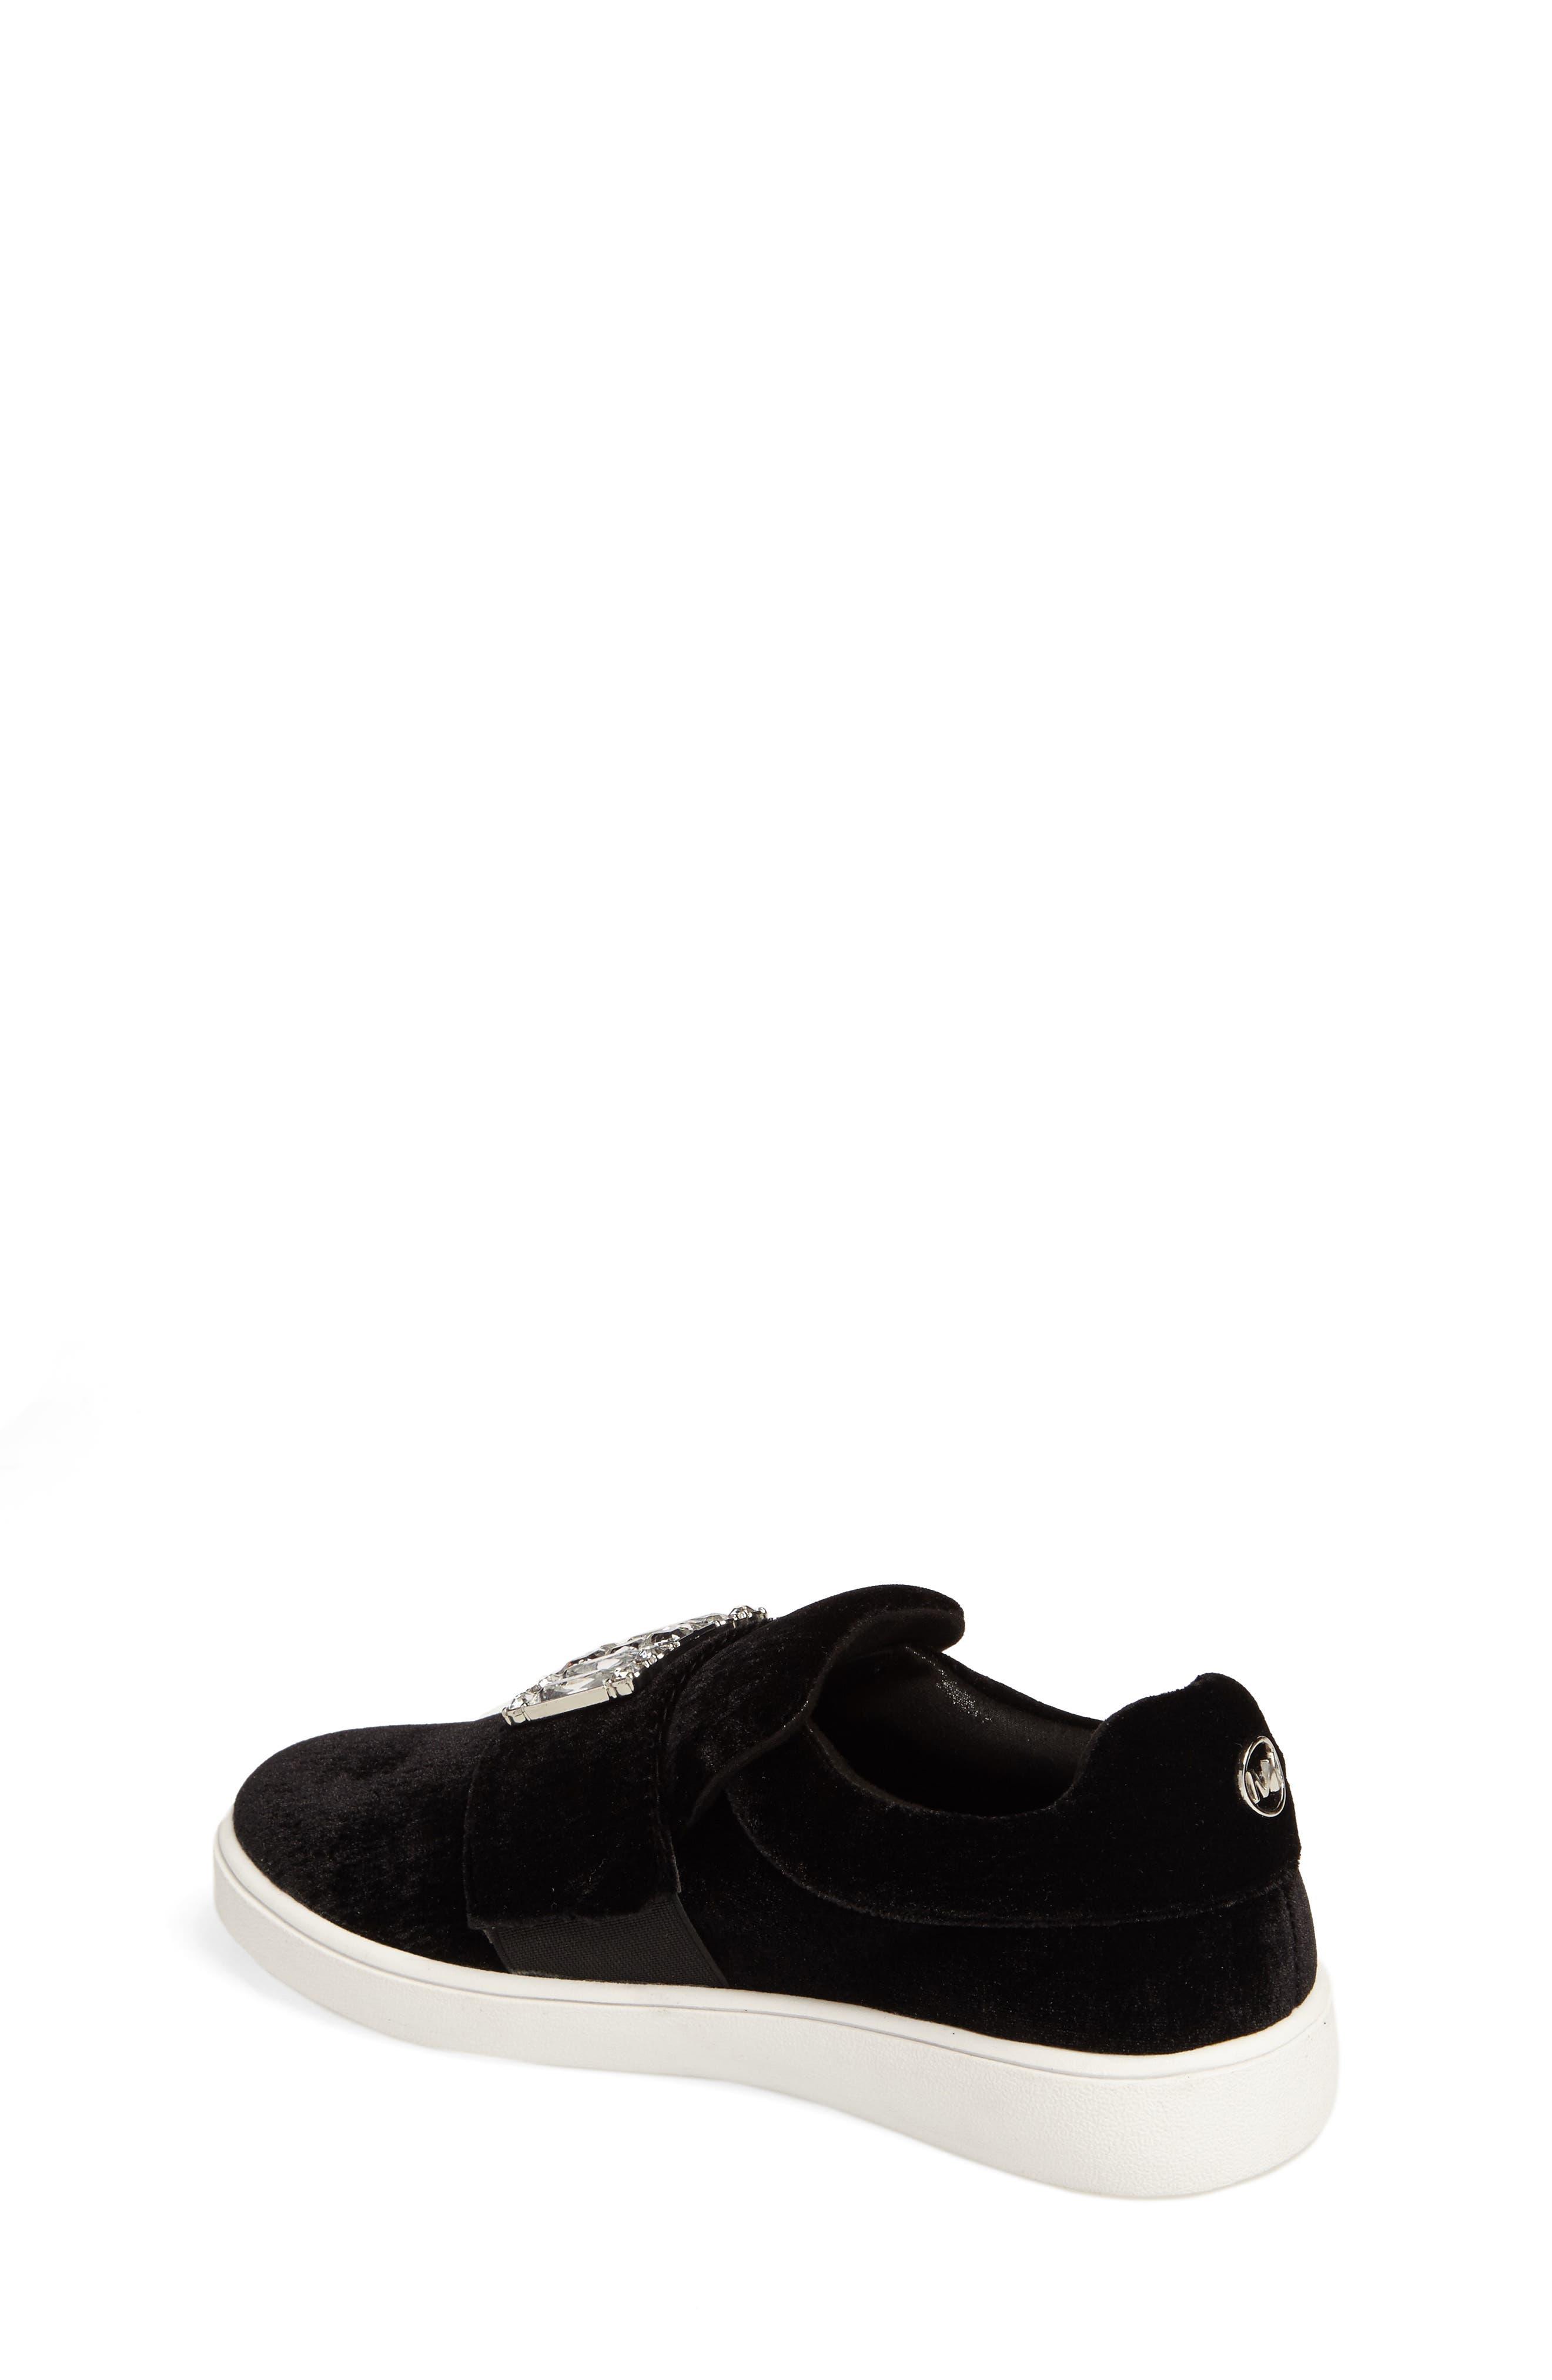 Ivy Dream Embellished Slip-On Sneaker,                             Alternate thumbnail 2, color,                             001